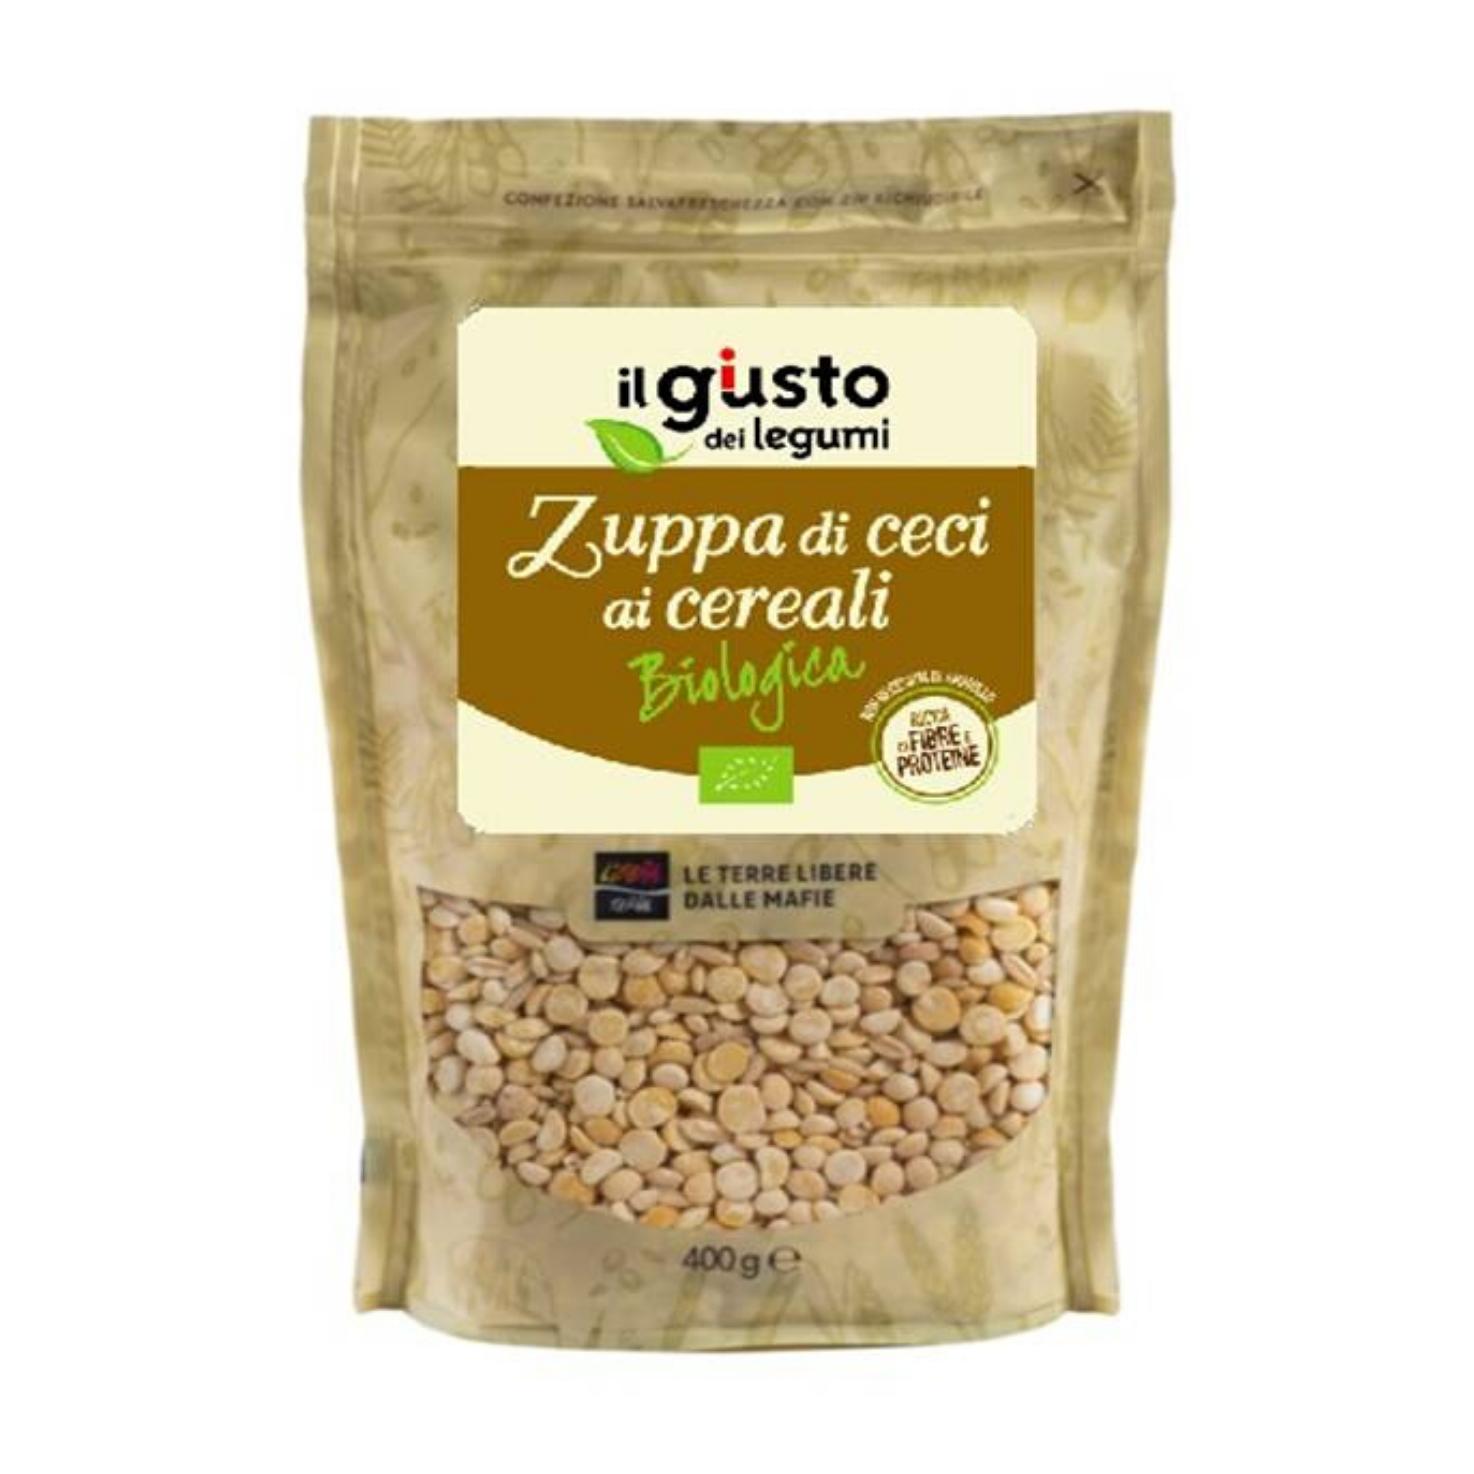 Zuppa di Ceci ai Cereali Biologica 400g